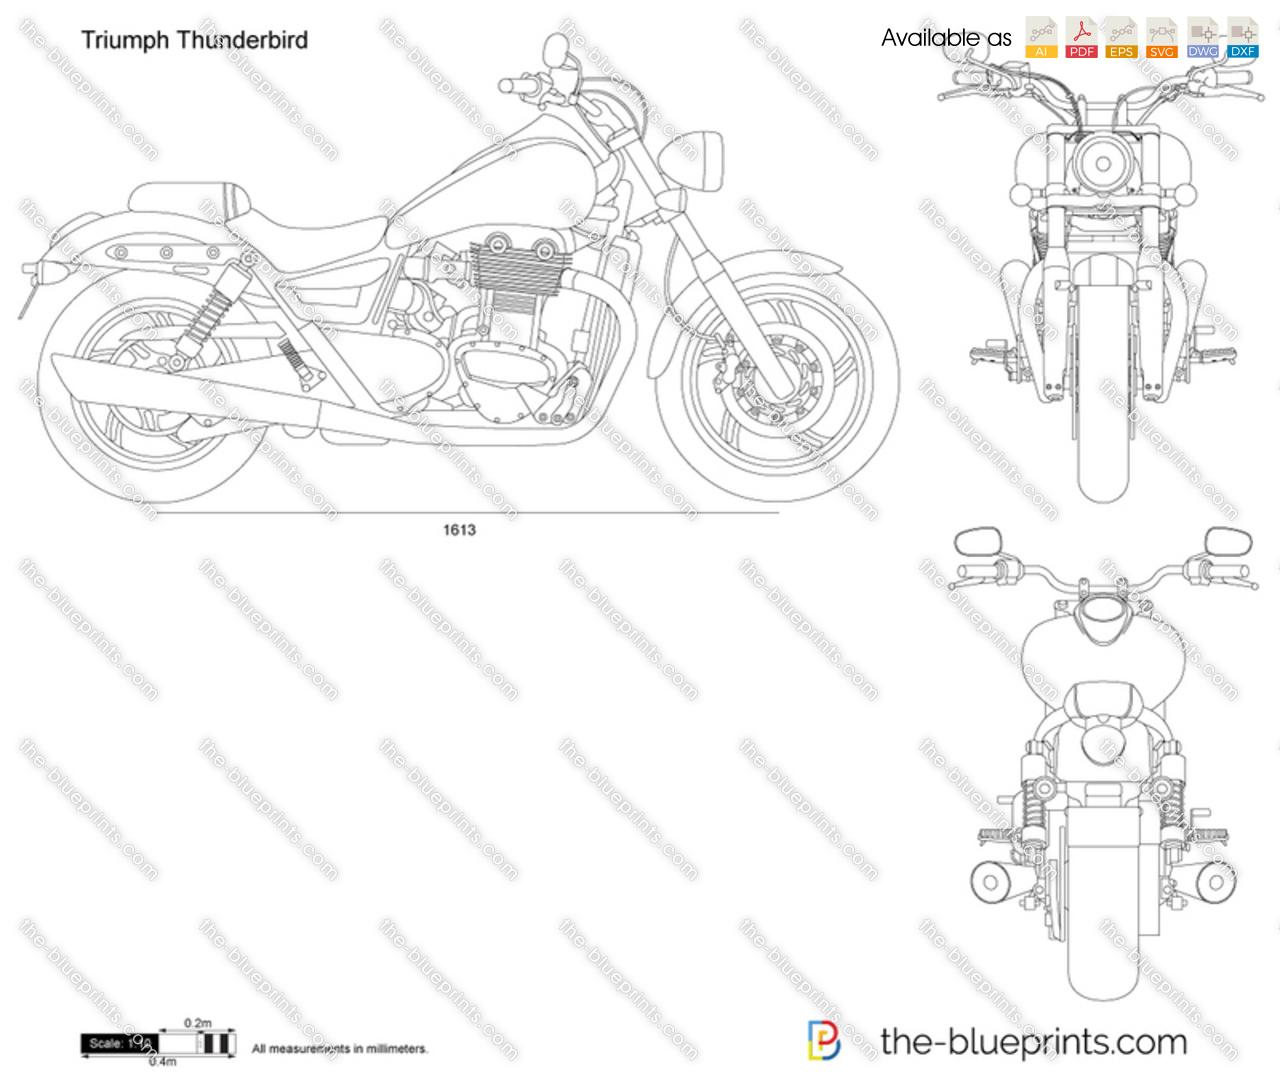 Triumph Thunderbird vector drawing